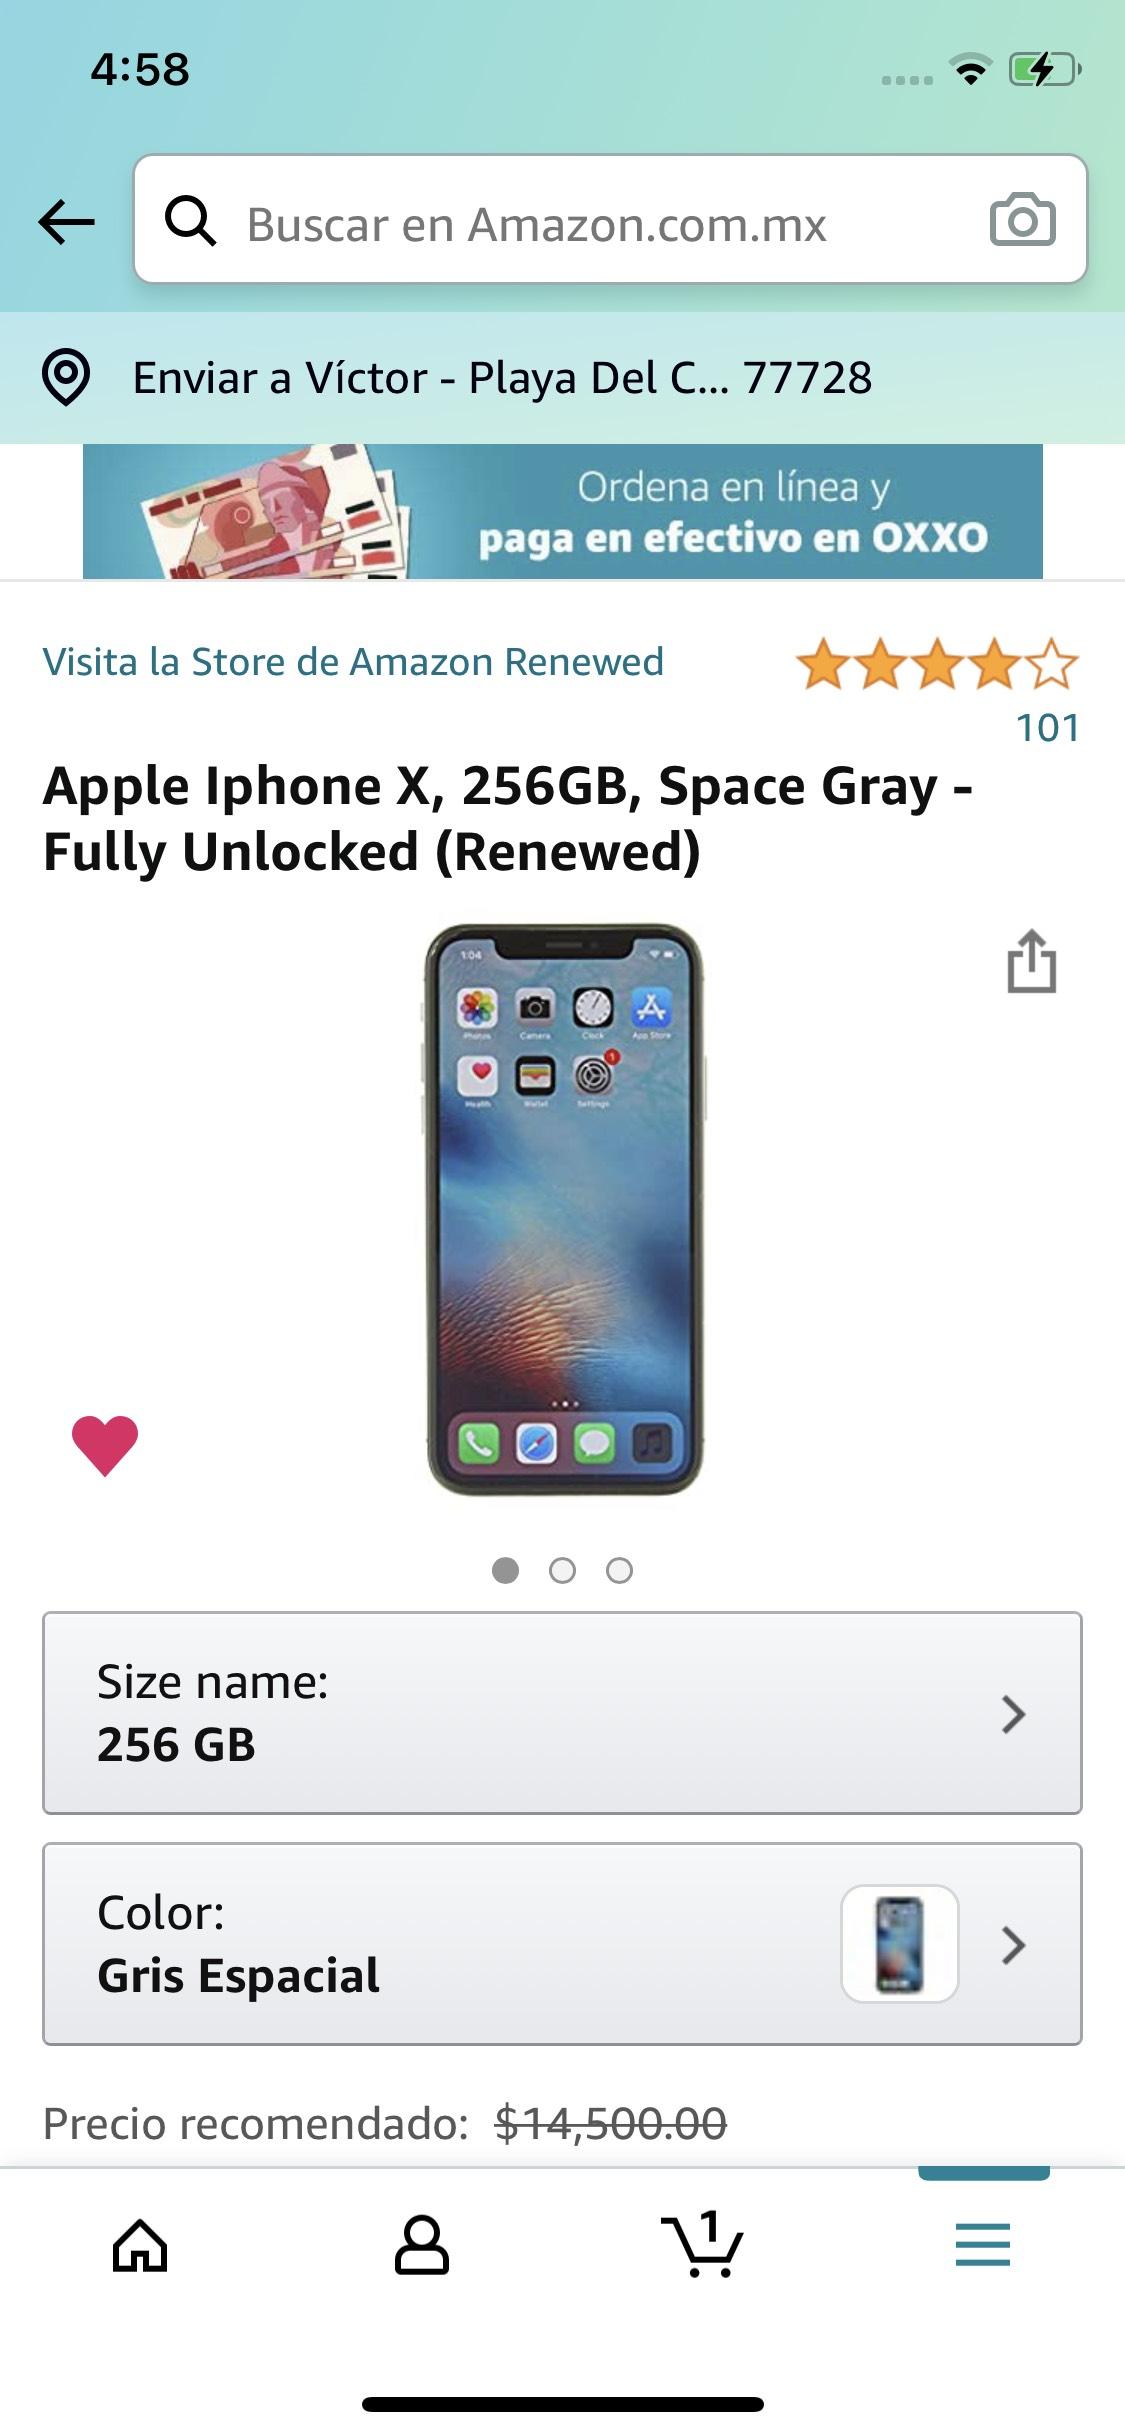 Amazon: Apple Iphone X, 256GB, Space Gray - Fully Unlocked (Renewed)